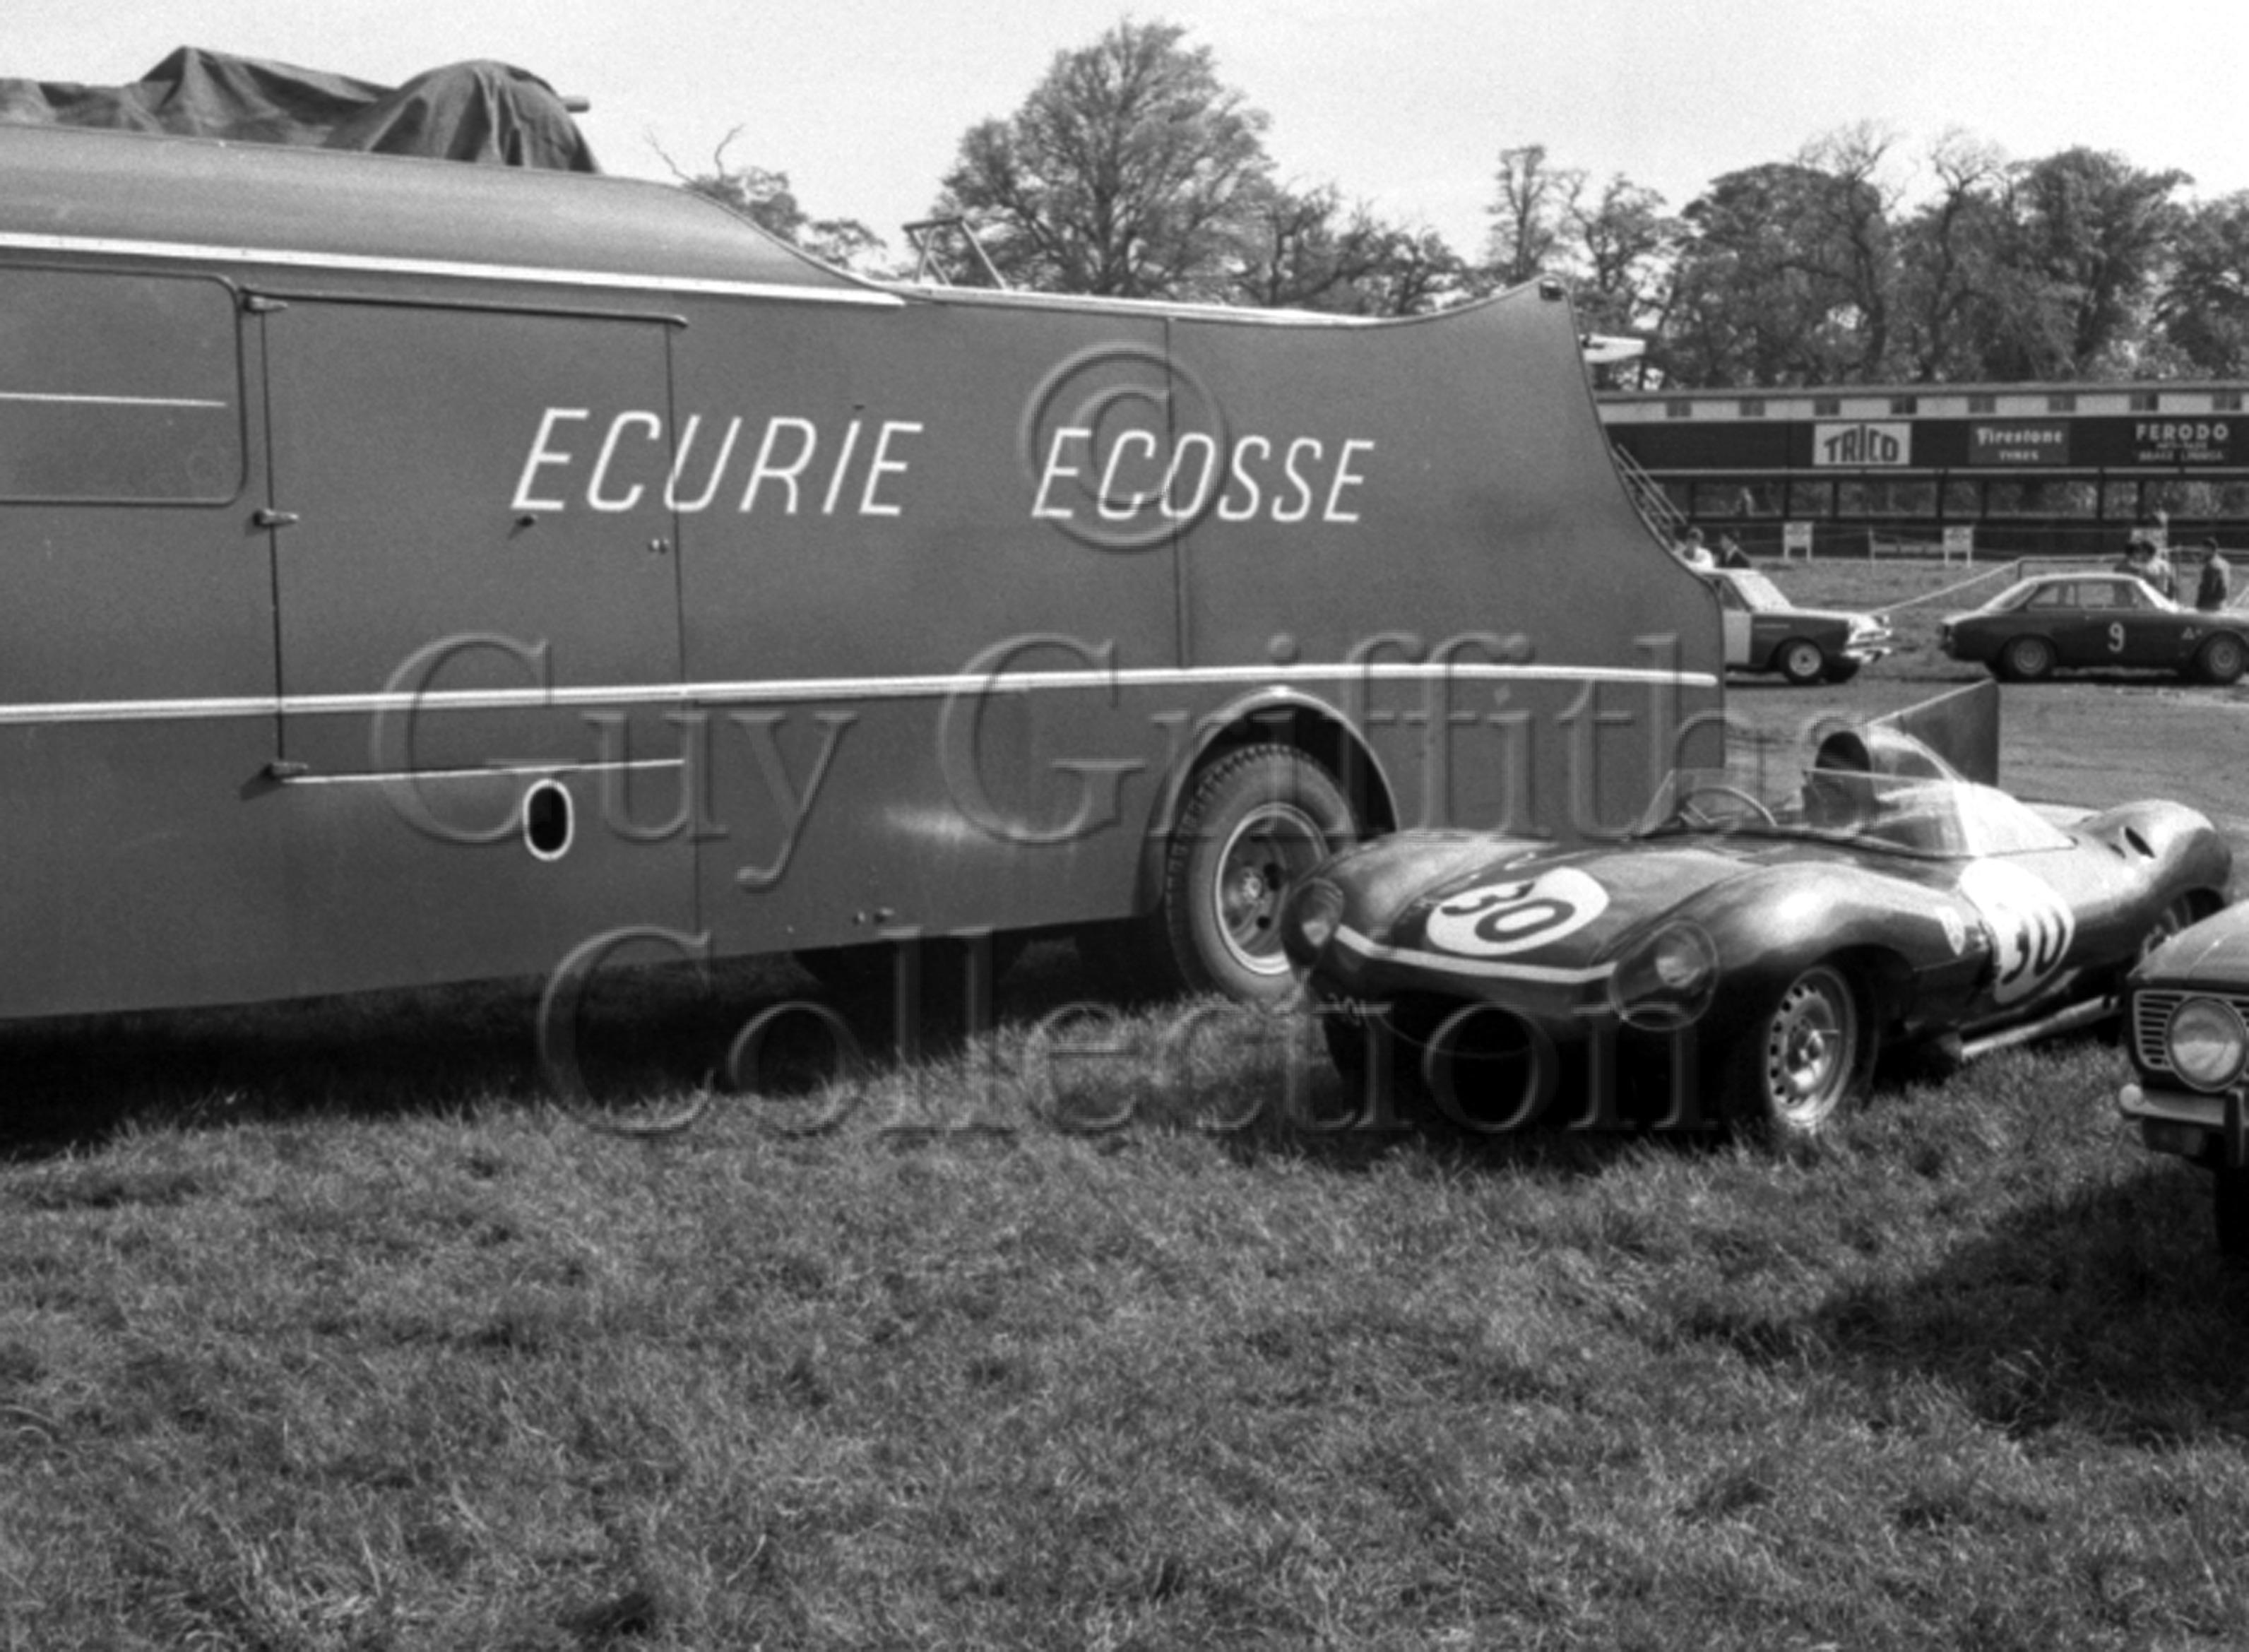 105-691–Ecurie-Ecosse-transporter–Griffiths-Formula–Oulton-Park–29-05-1967.jpg - Guy Griffiths Collection